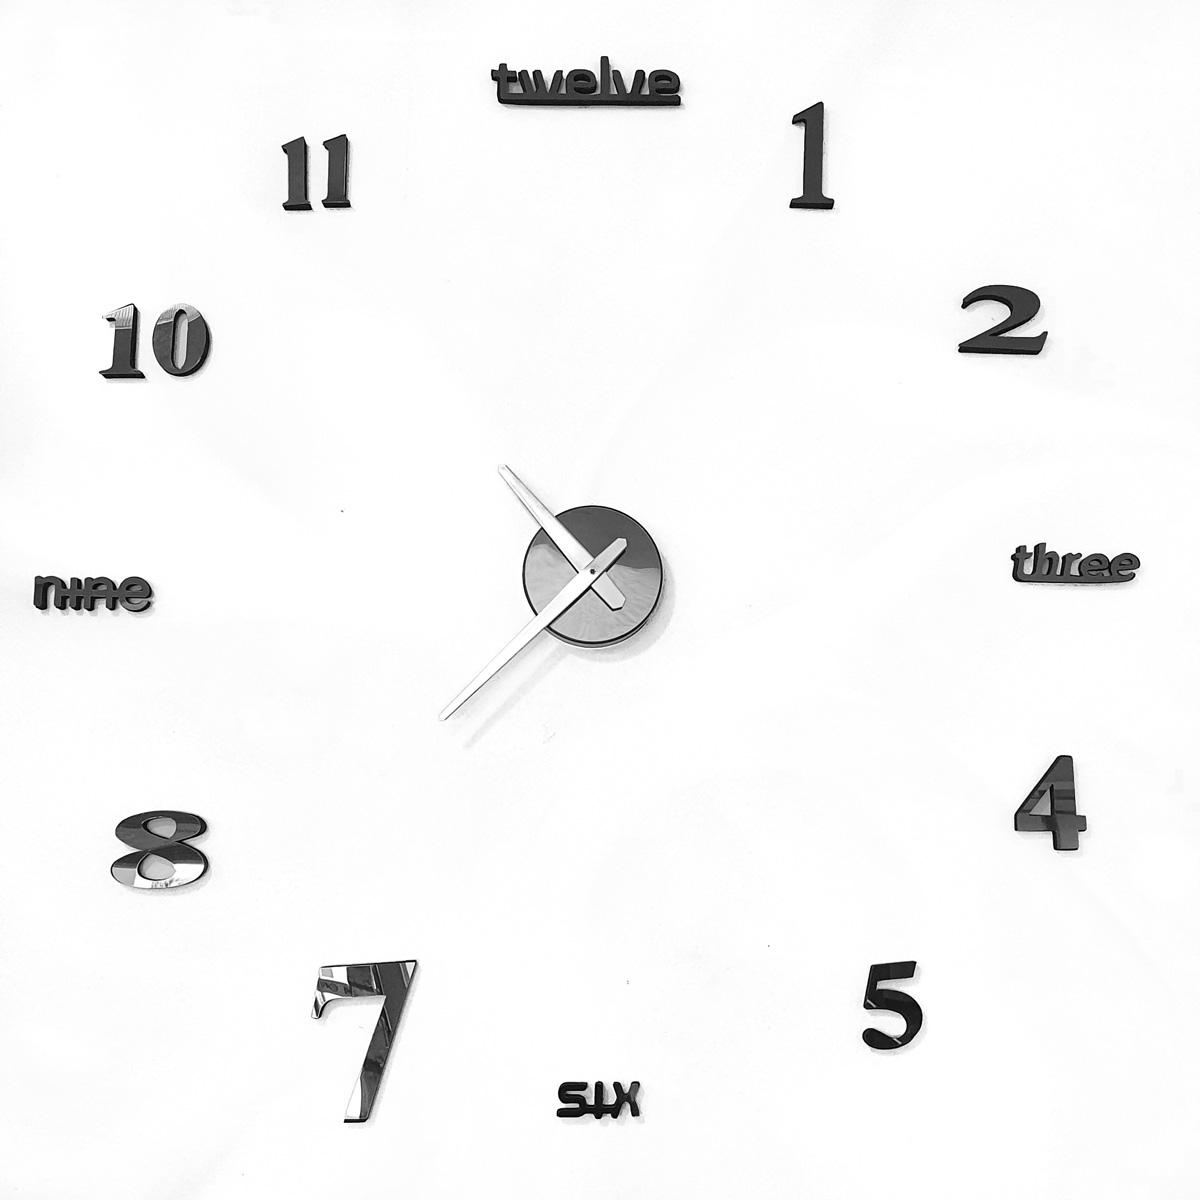 Relógio De Parede Adesivo Espelhado Redondo Diy Decorativo